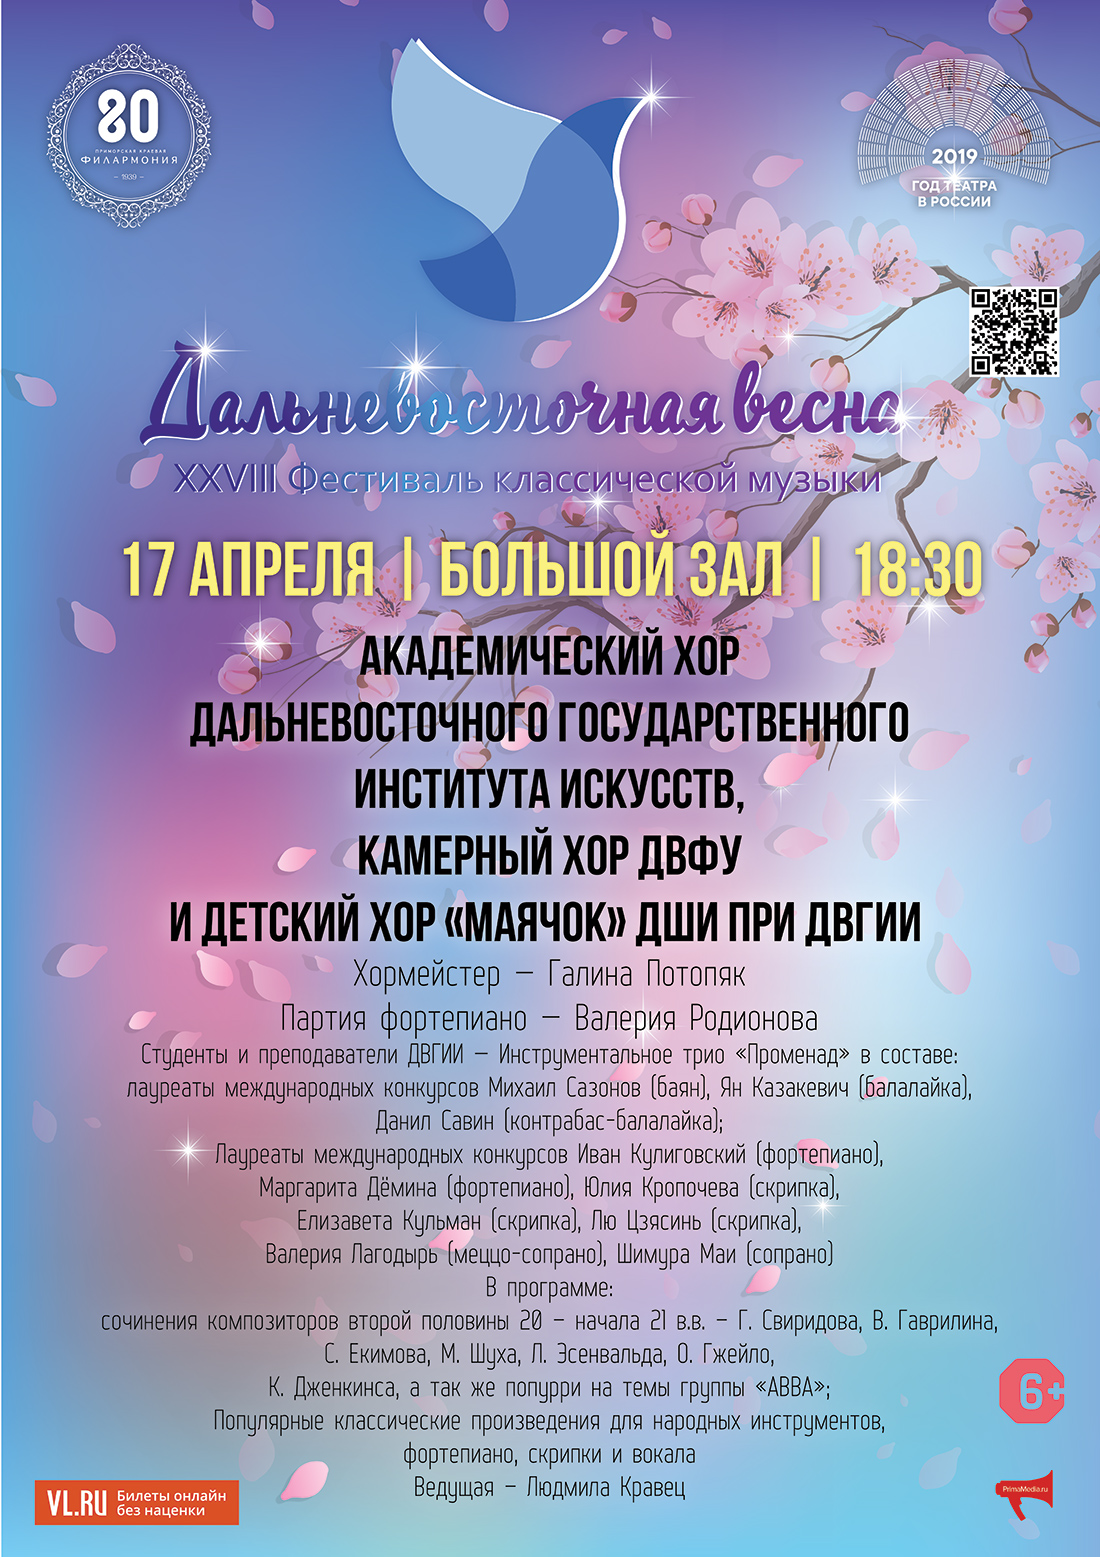 17 <br> апреля Камерный хор ДВФУ и детский хор «Маячок»